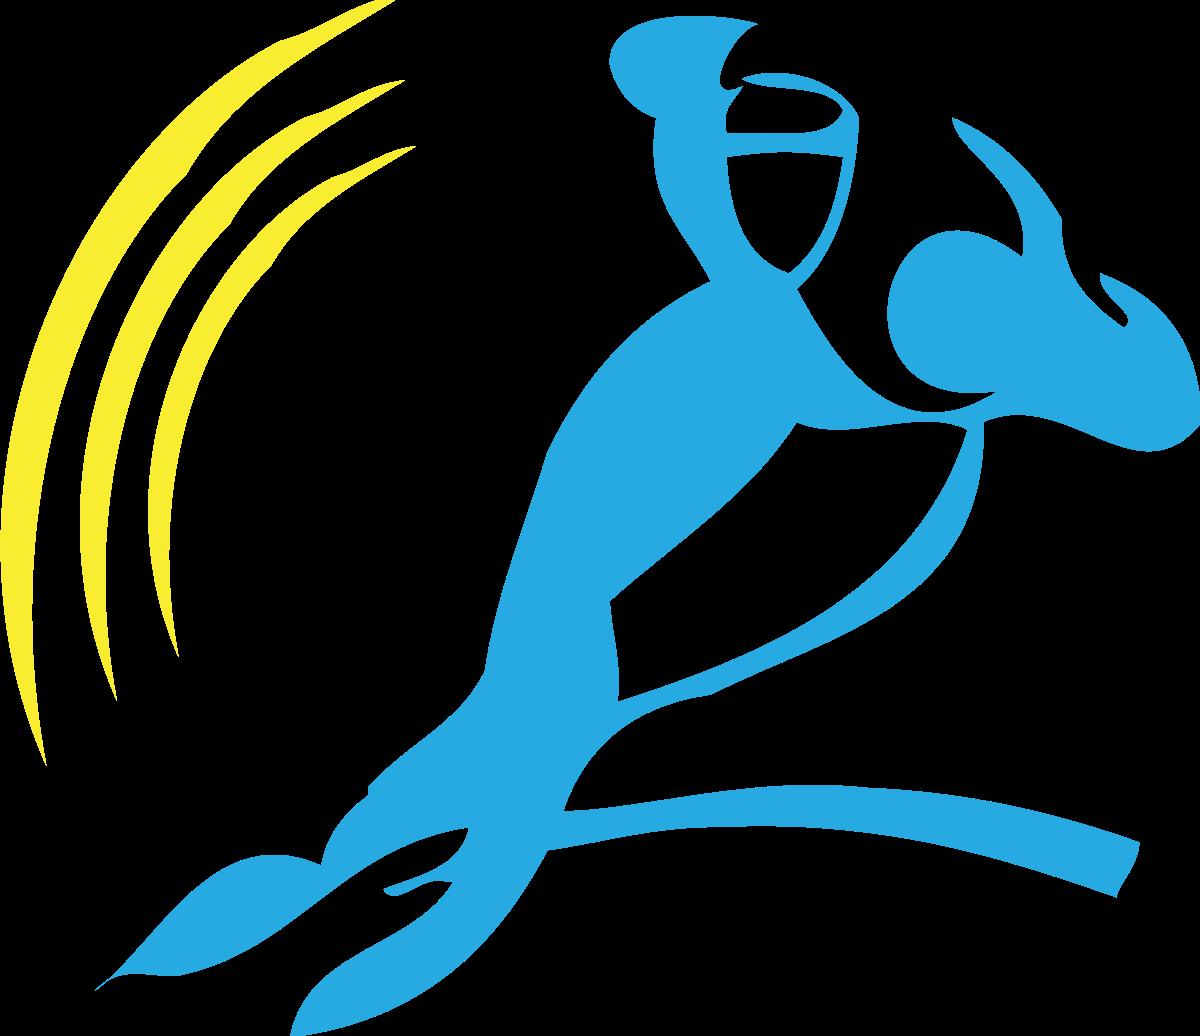 National Skating Federation (Kazakhstan) - Wikipedia image free